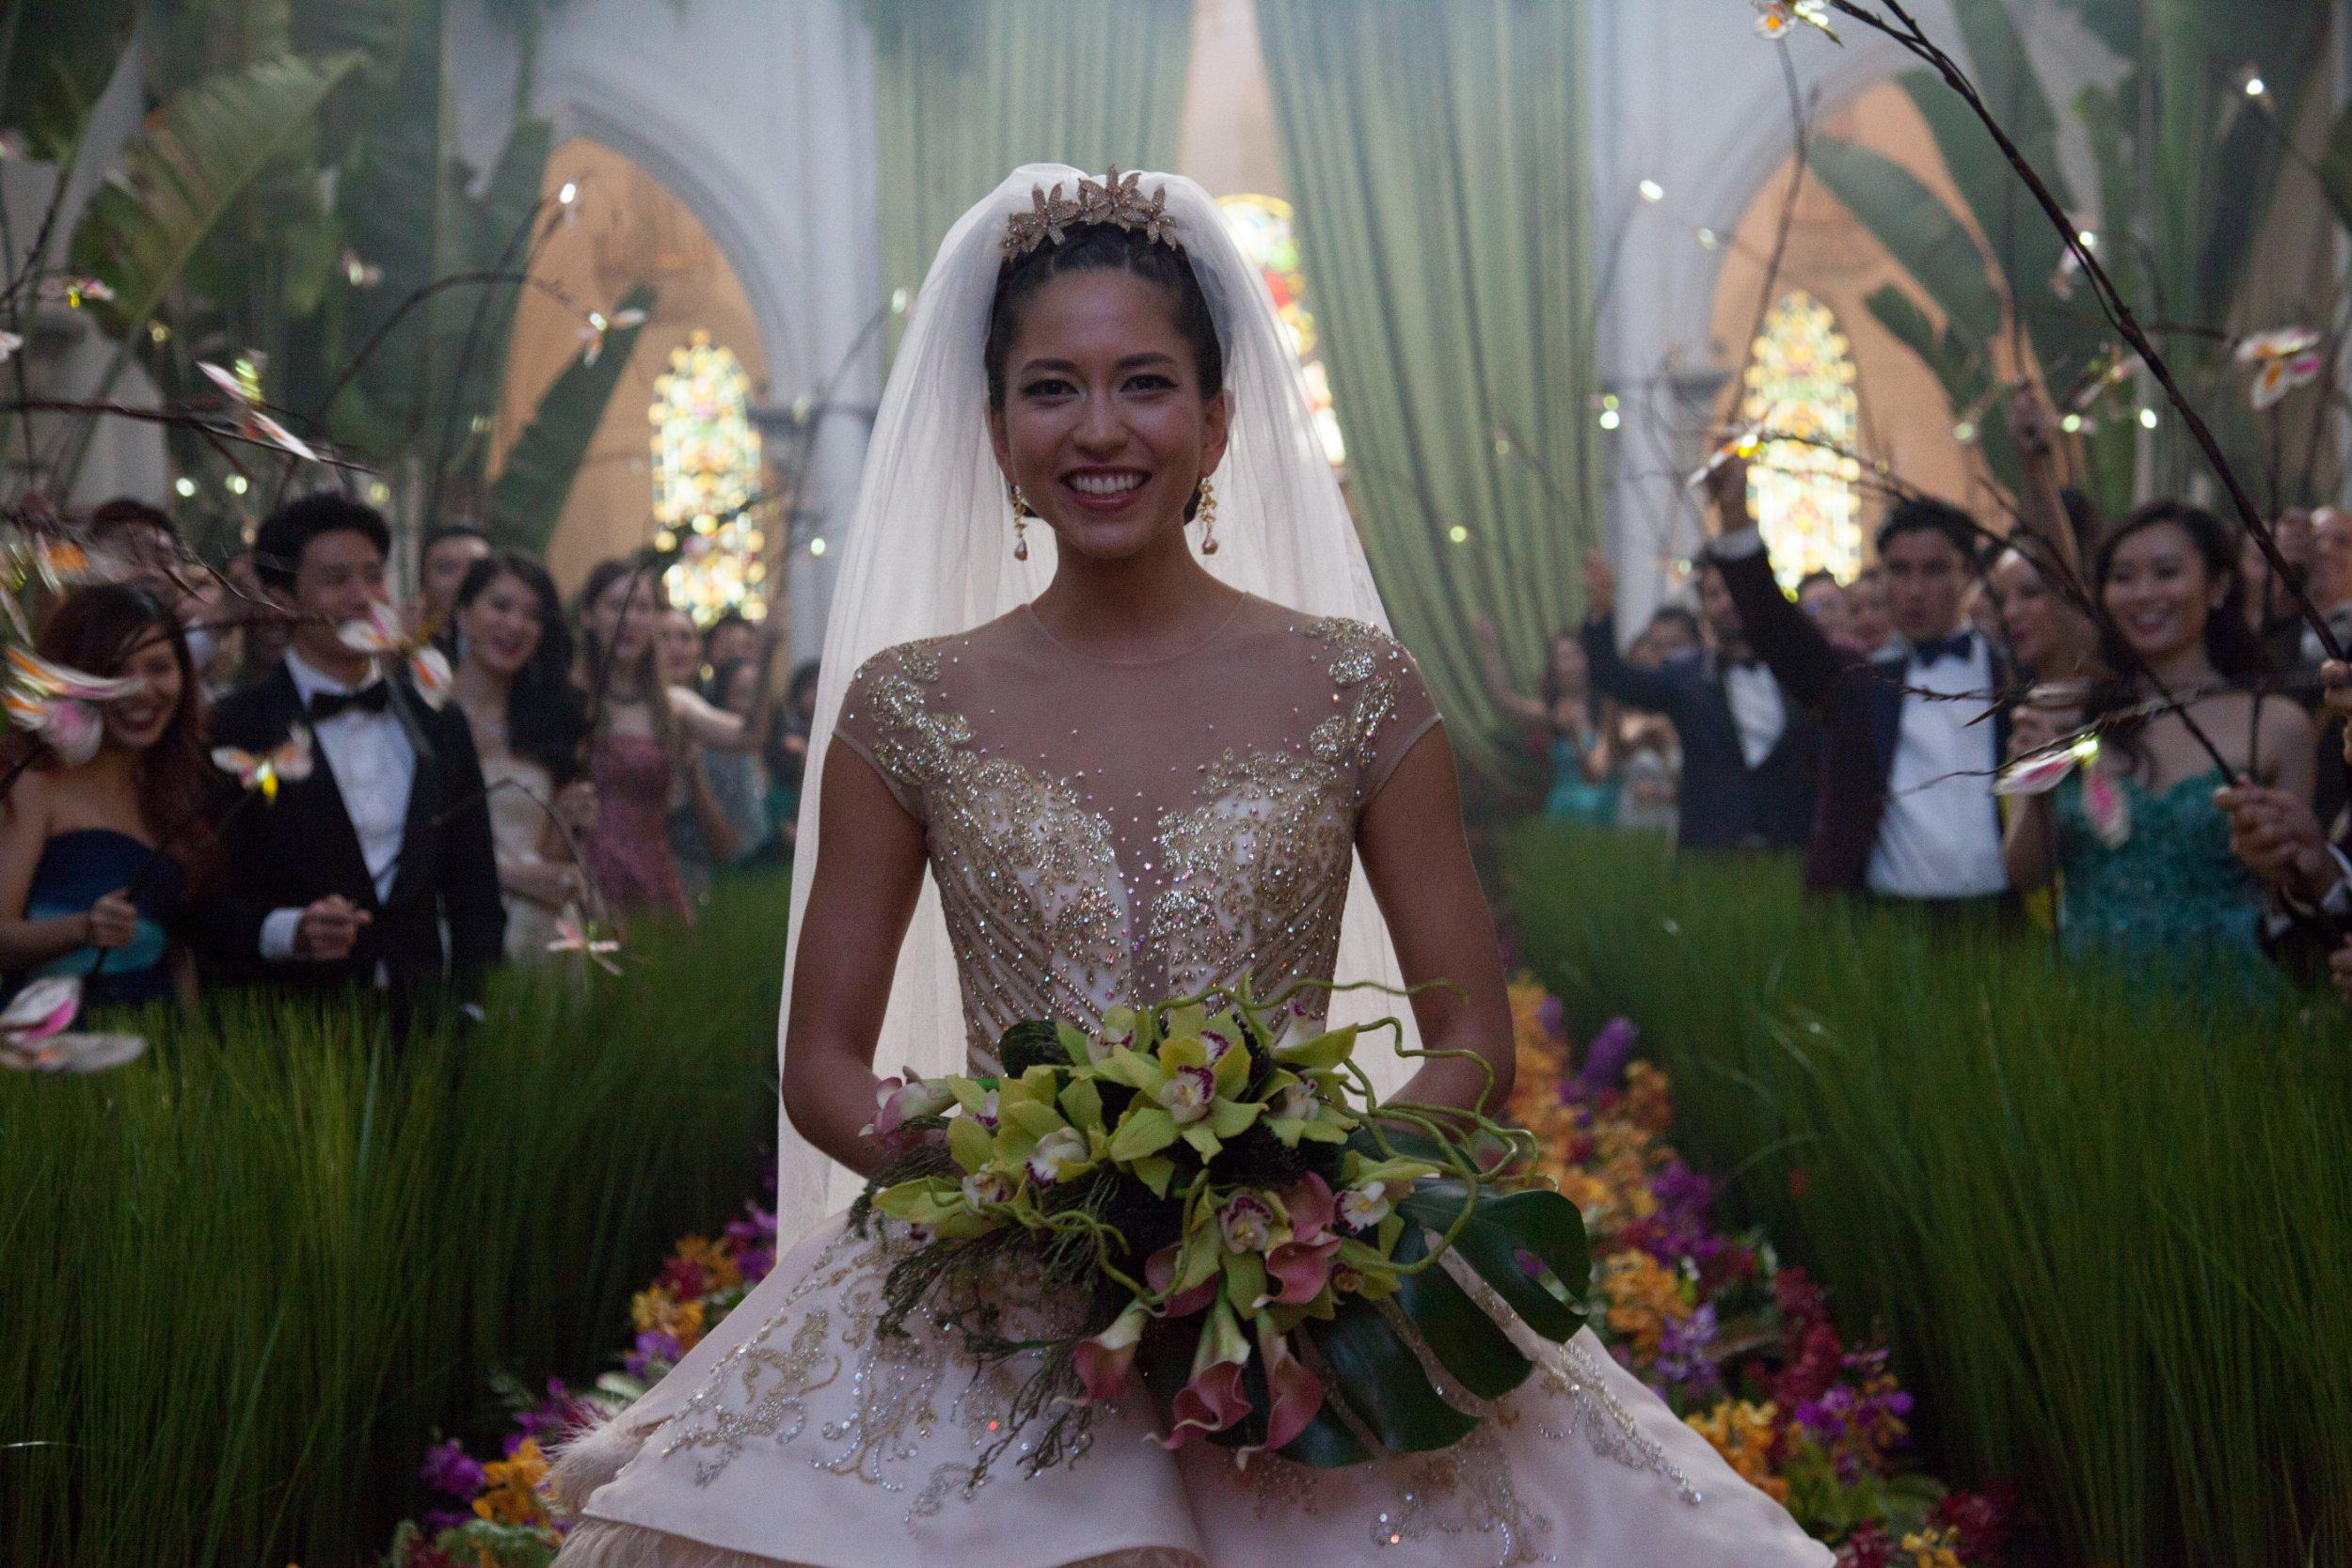 Crazy Rich Asians director was 'heartbroken' over pay gap